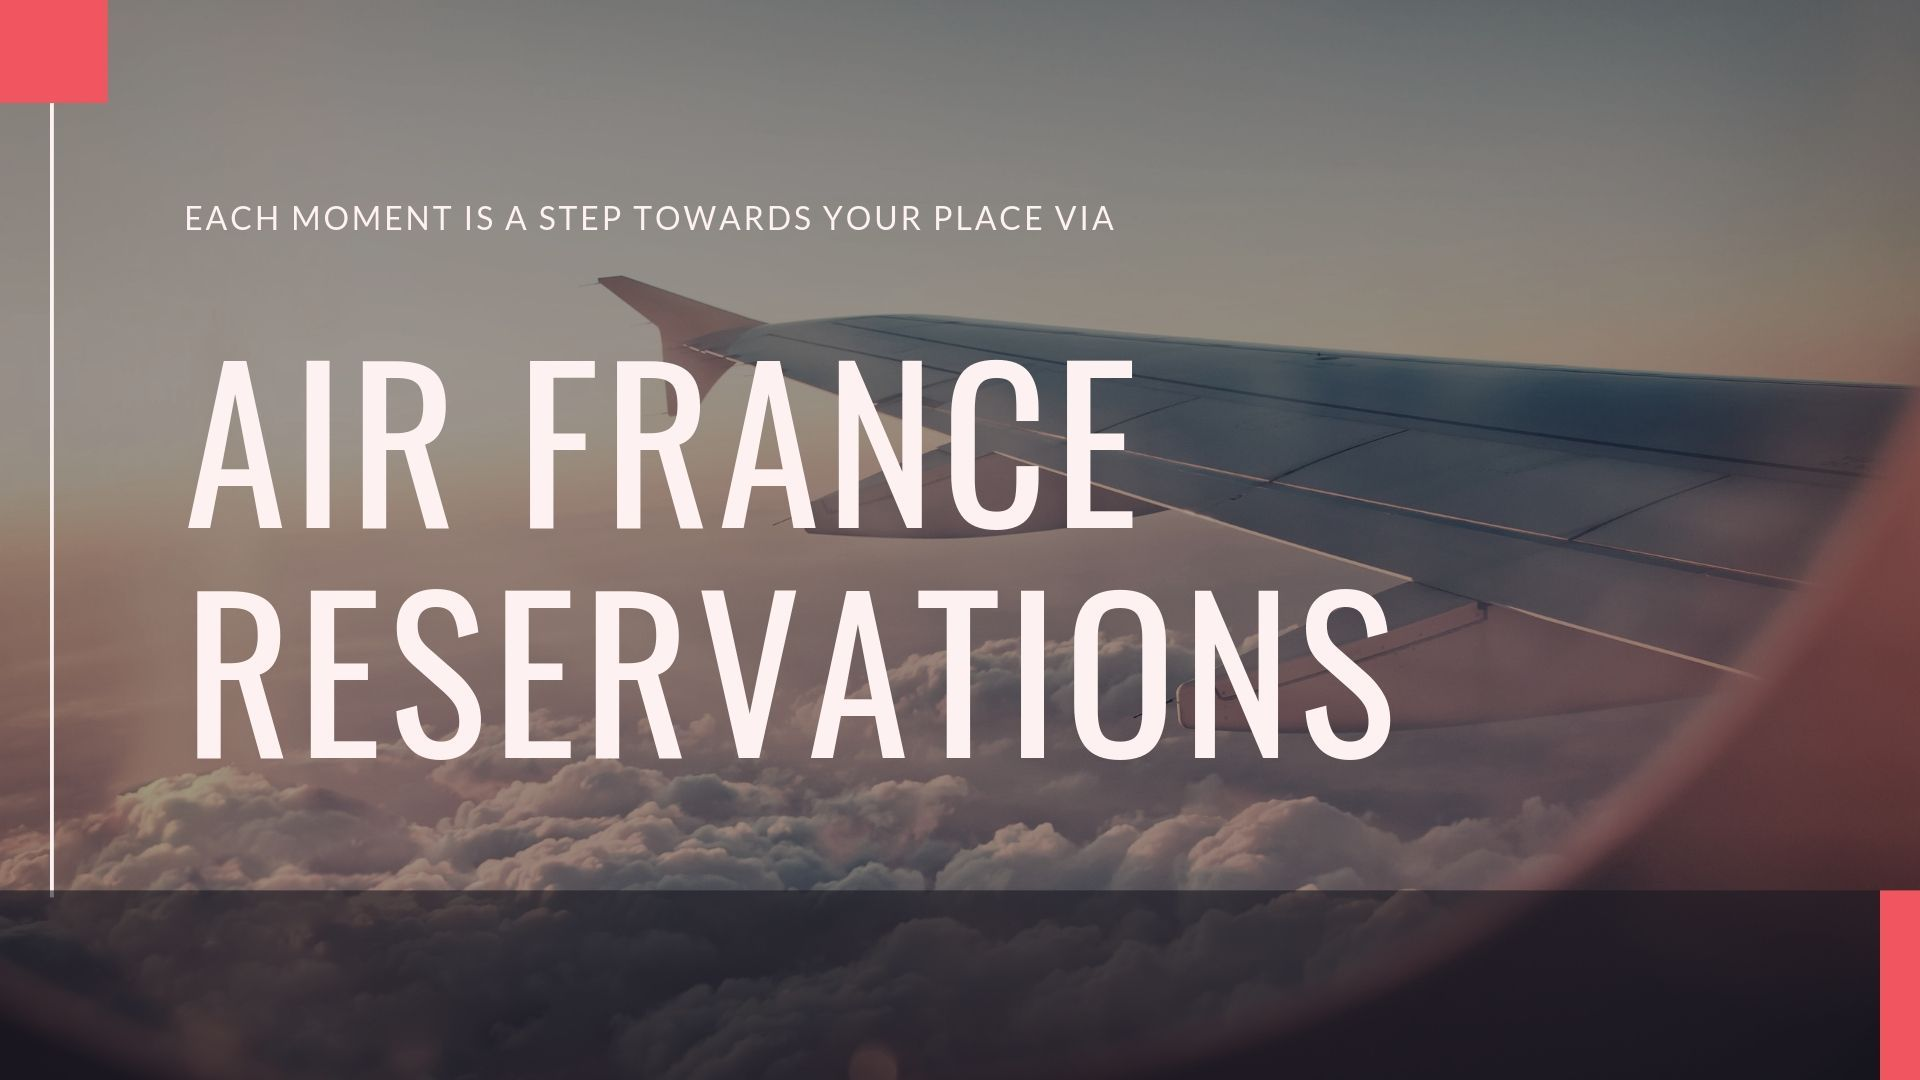 Air France Air france, France airlines, France